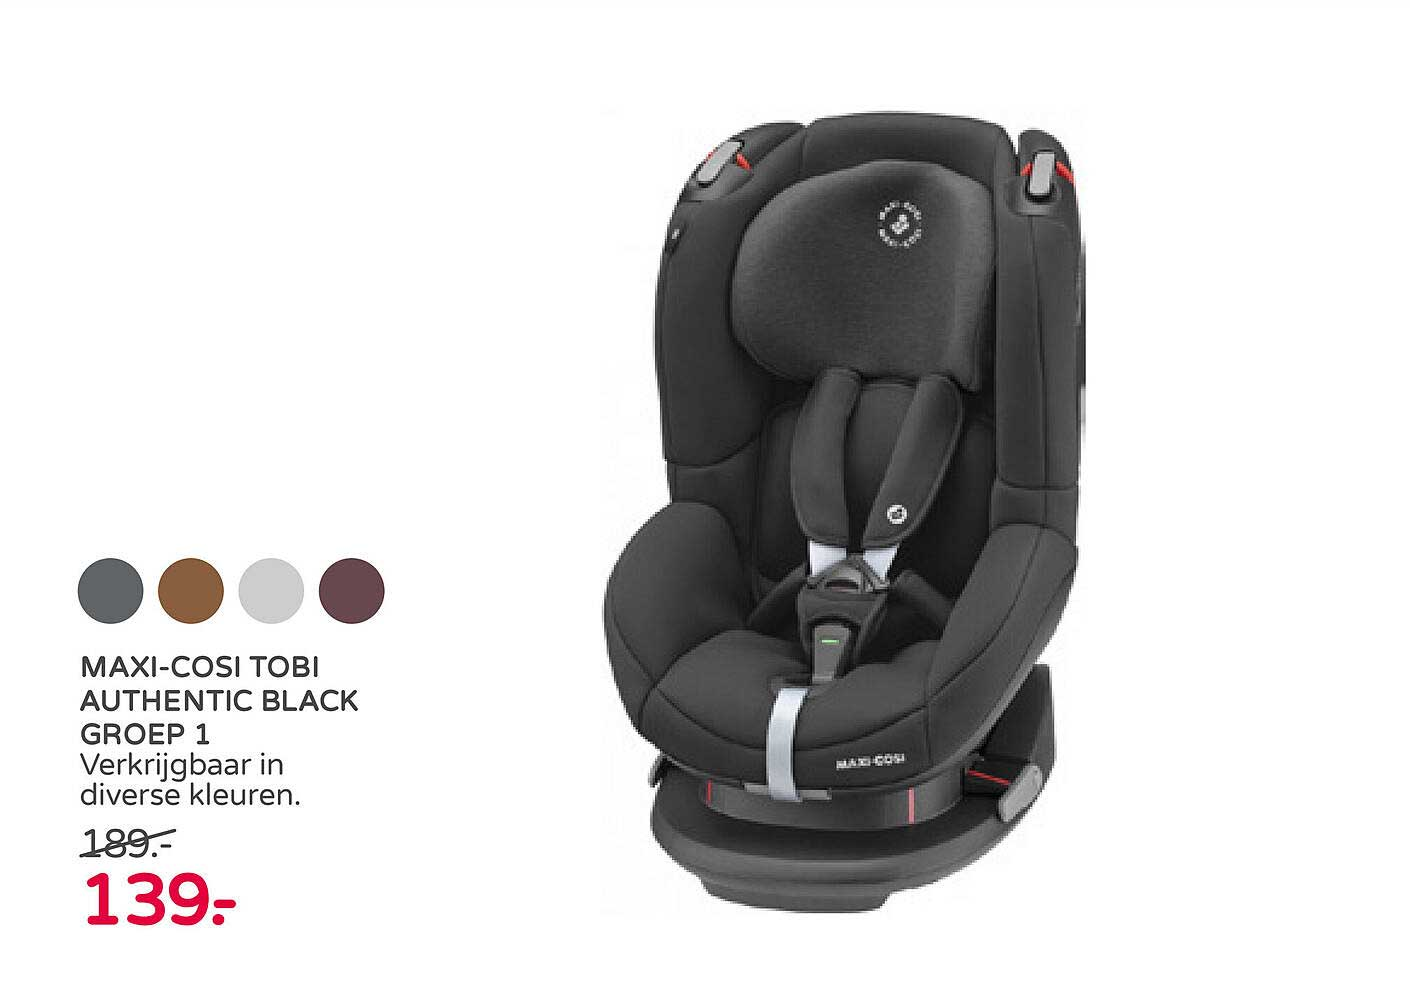 Prénatal Maxi-Cosi Tobi Authentic Black Groep 1 Autostoel